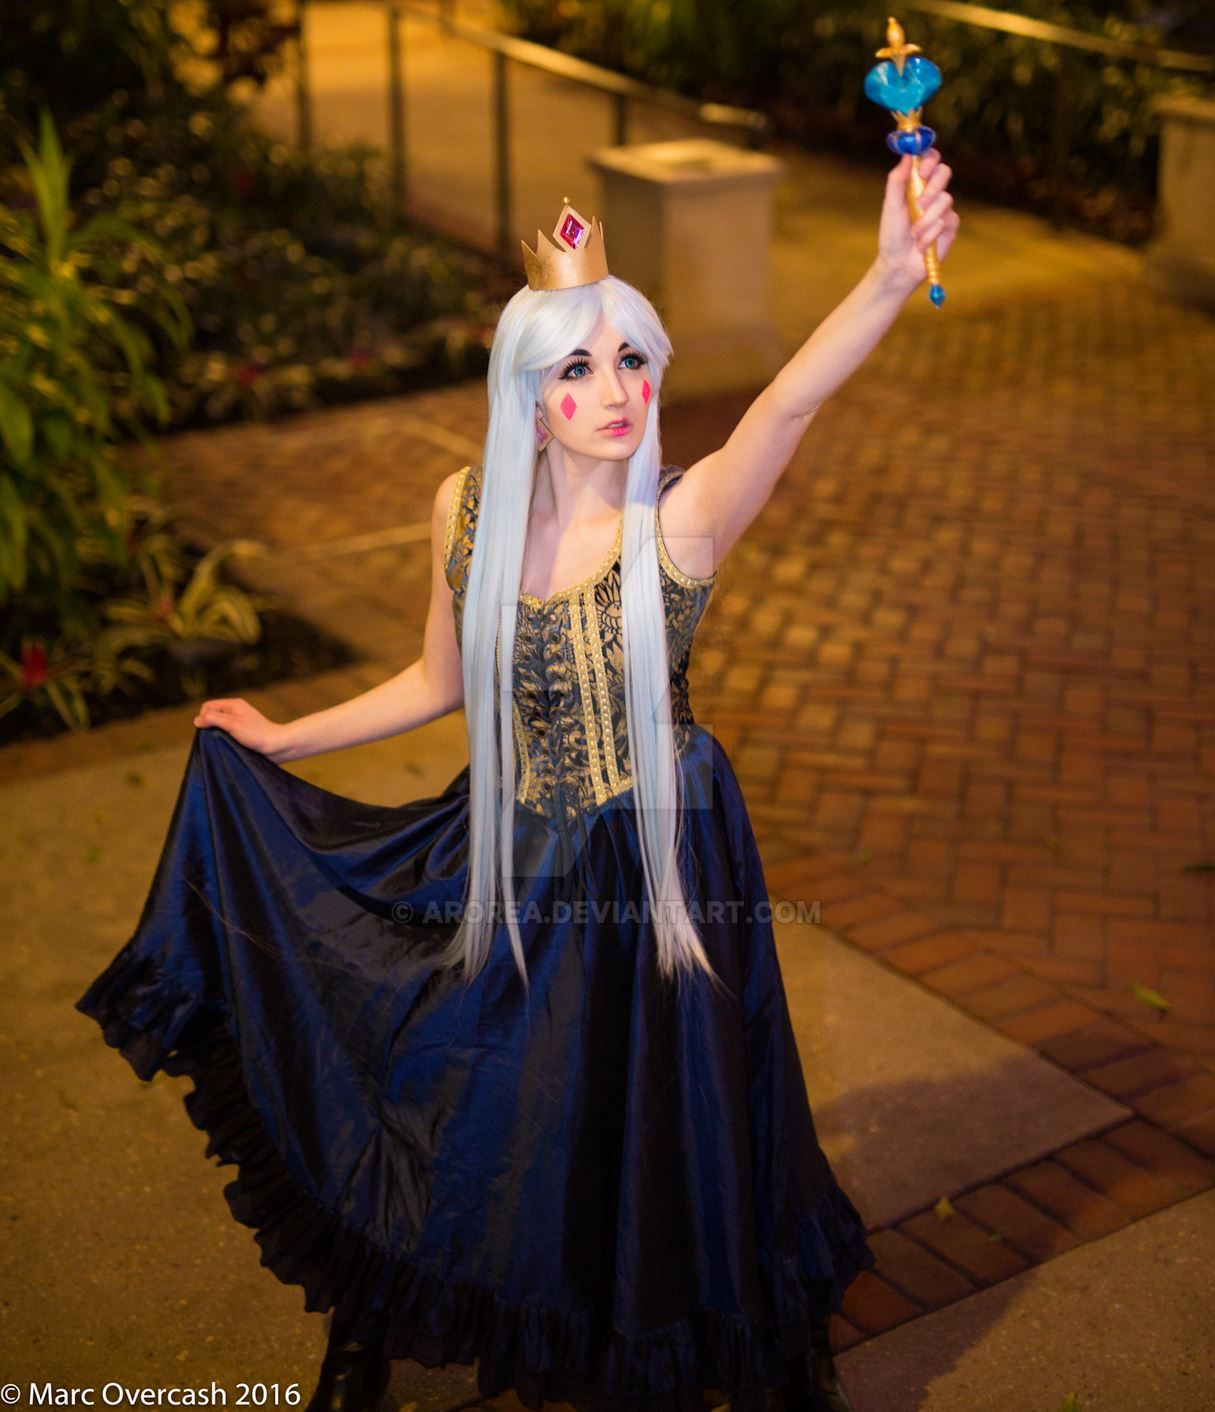 Queen Moon Butterfly Cosplay - SVTFOE by Arorea on DeviantArt